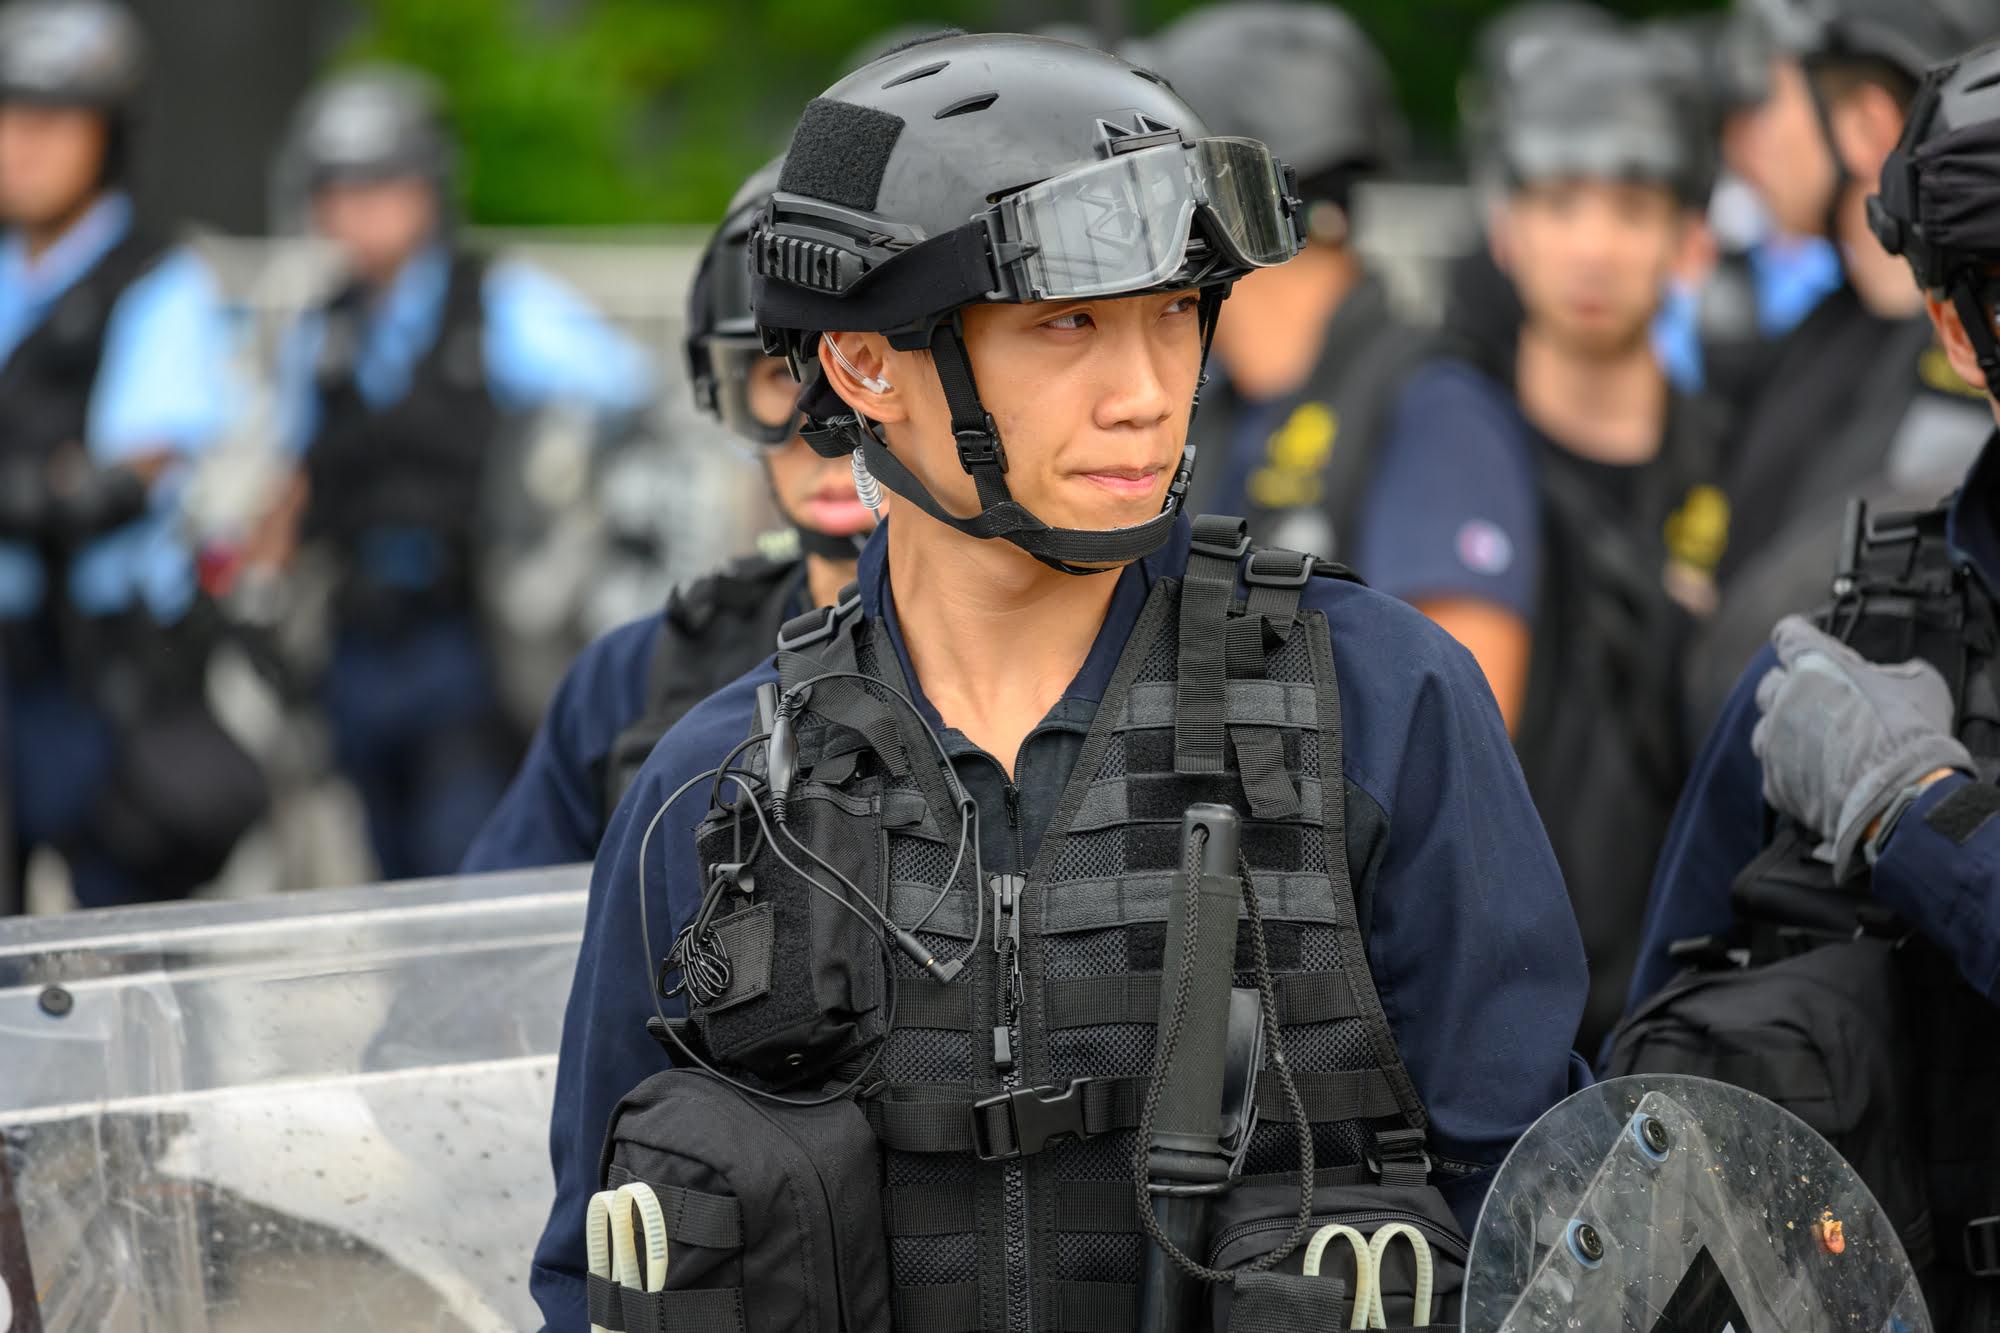 Why you should keep an eye on Hong Kong and China tonight